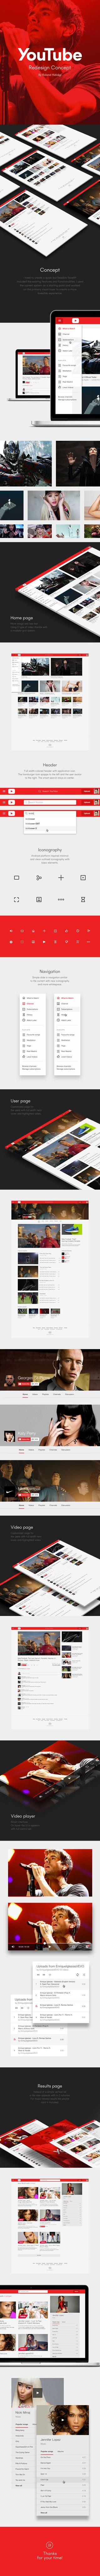 https://www.behance.net/gallery/22482013/YouTube-Redesign-Concept